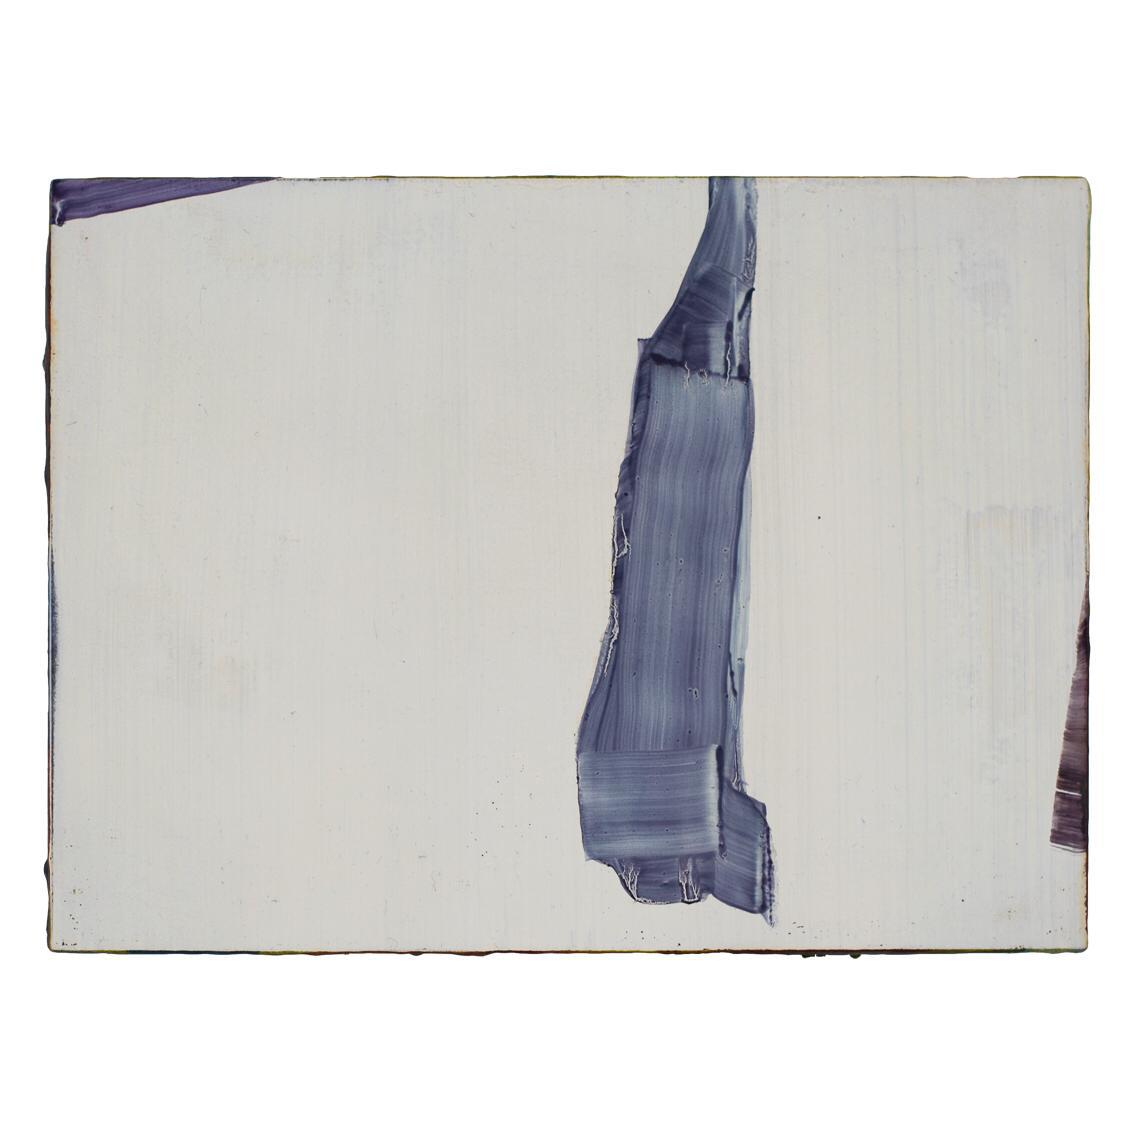 6. Markus Saile untitled_white 2019 olio su tavola 16x23cm